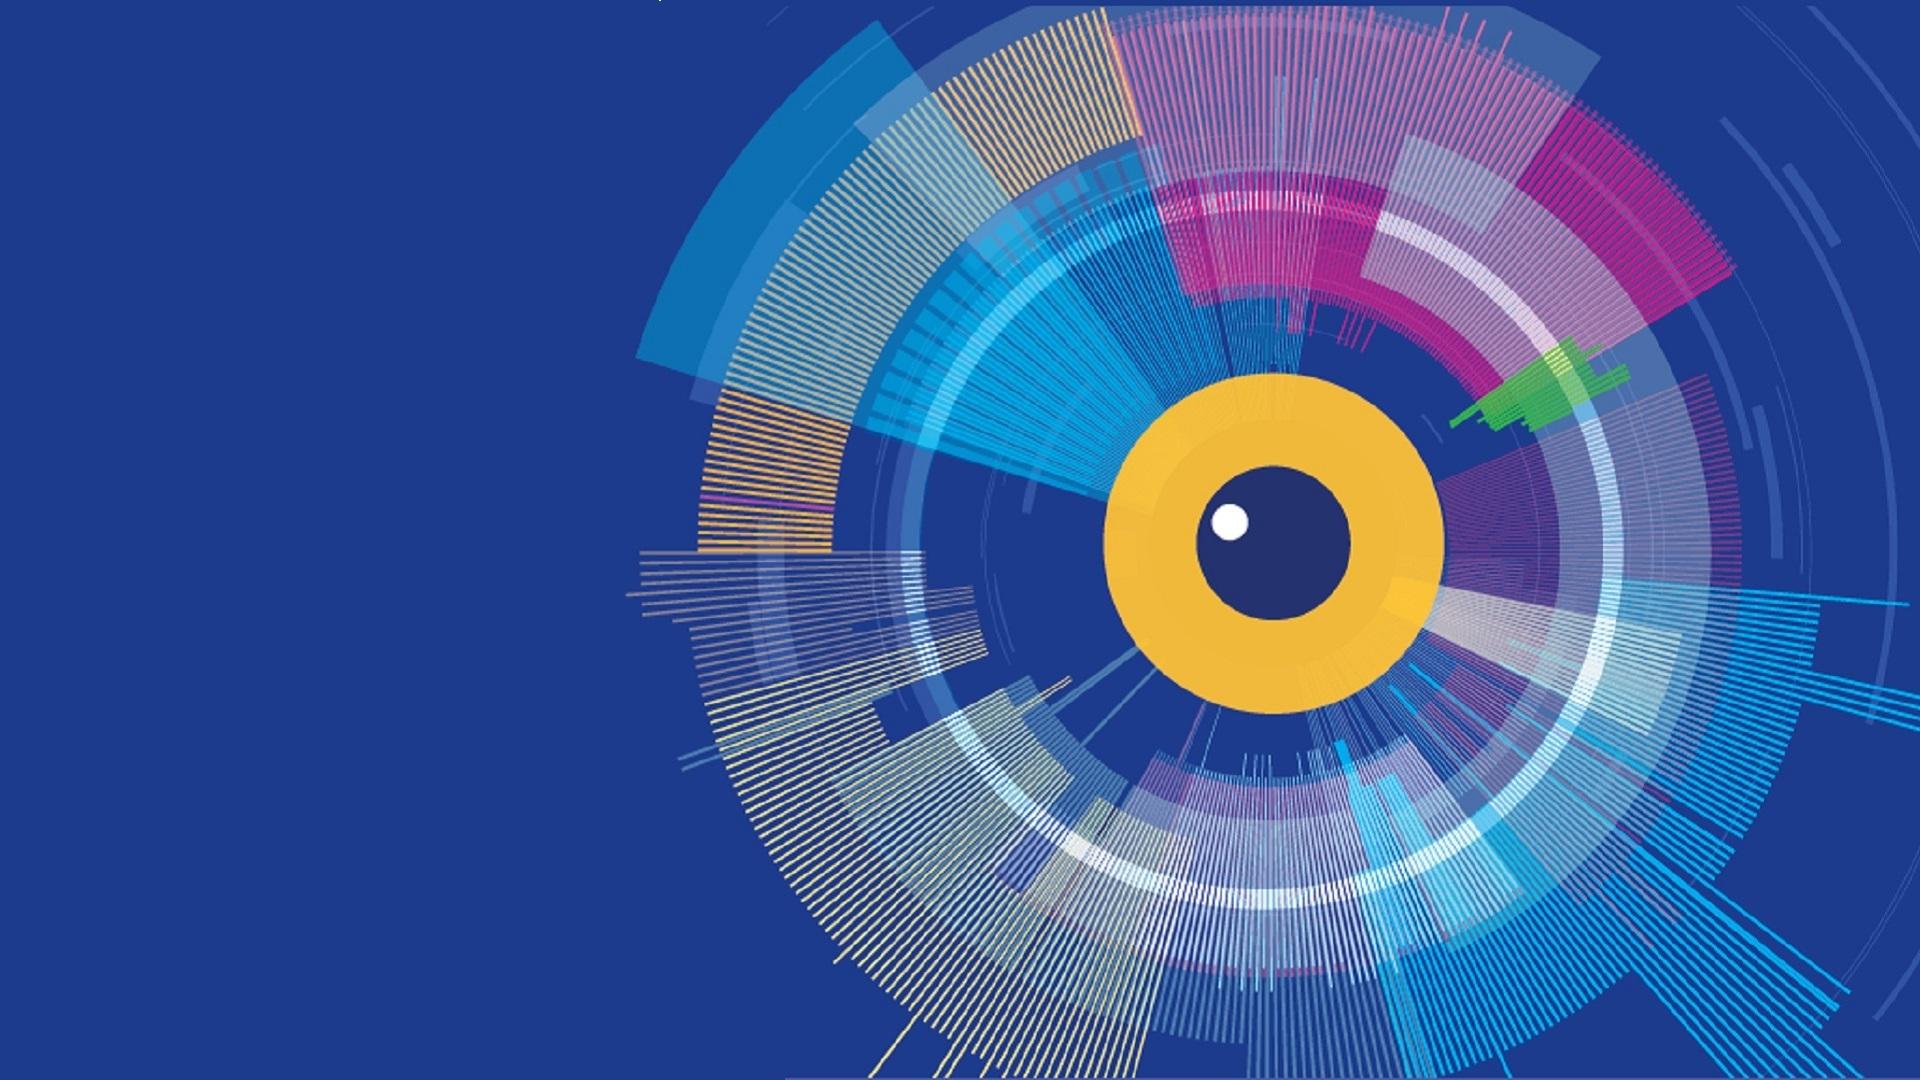 Serving citizens through better data visualisation